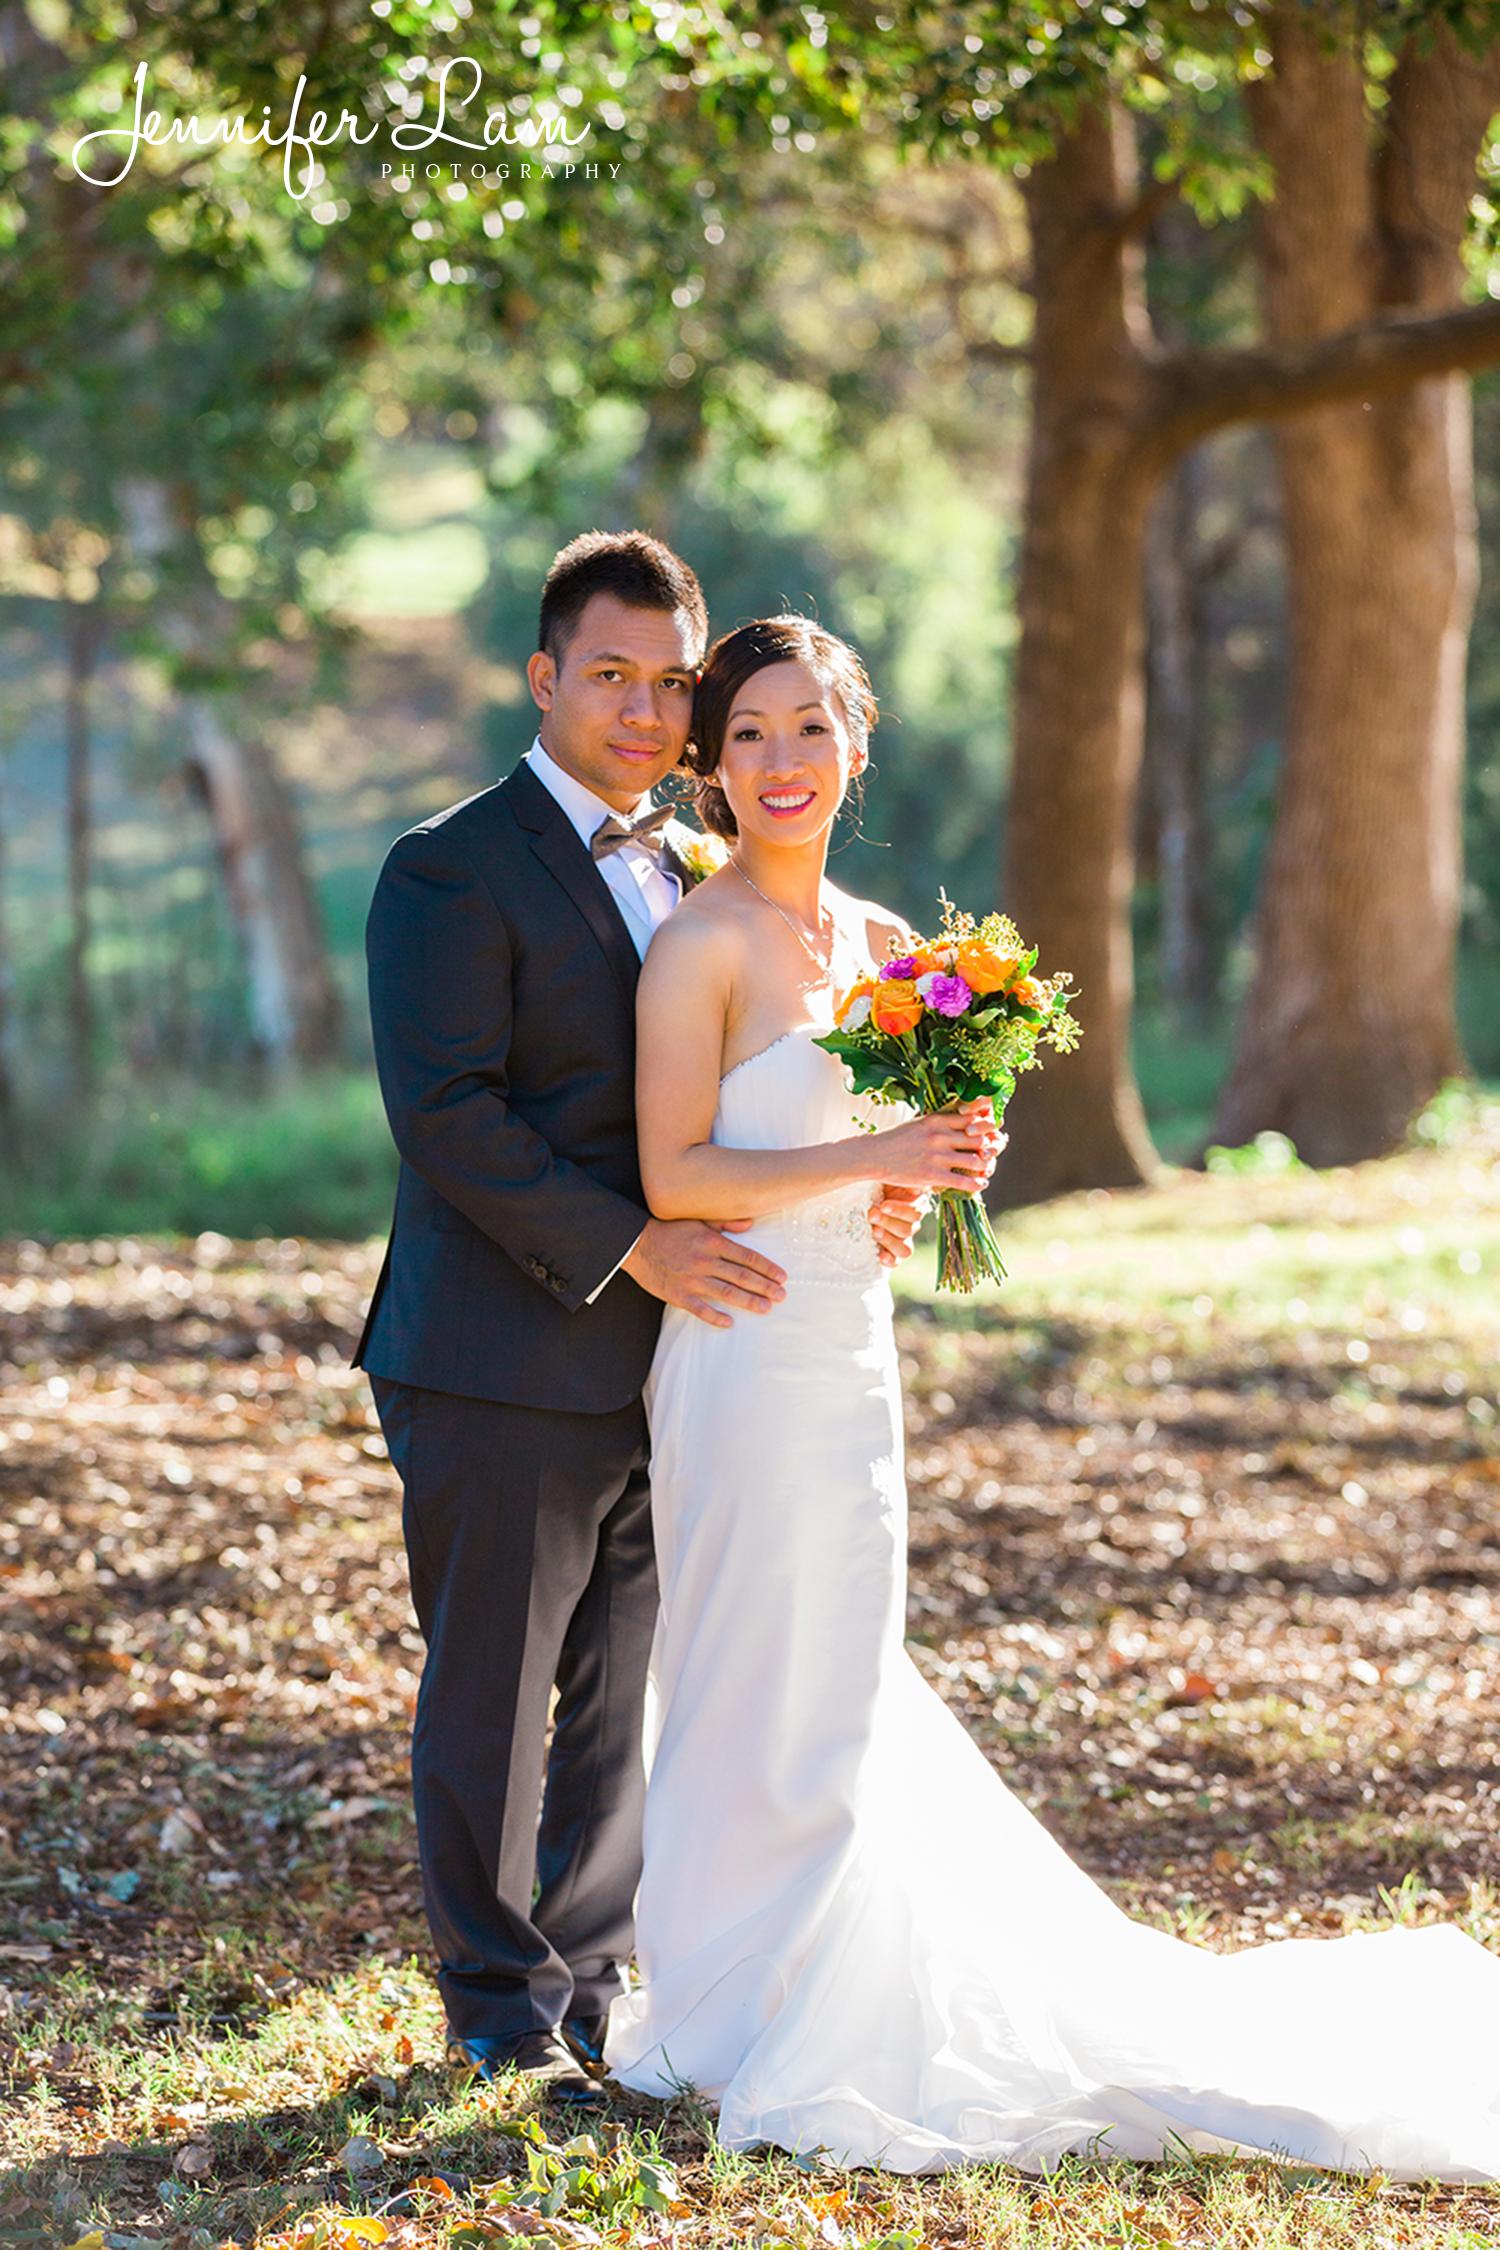 Sydney Wedding Photographer - Jennifer Lam Photography (75).jpg